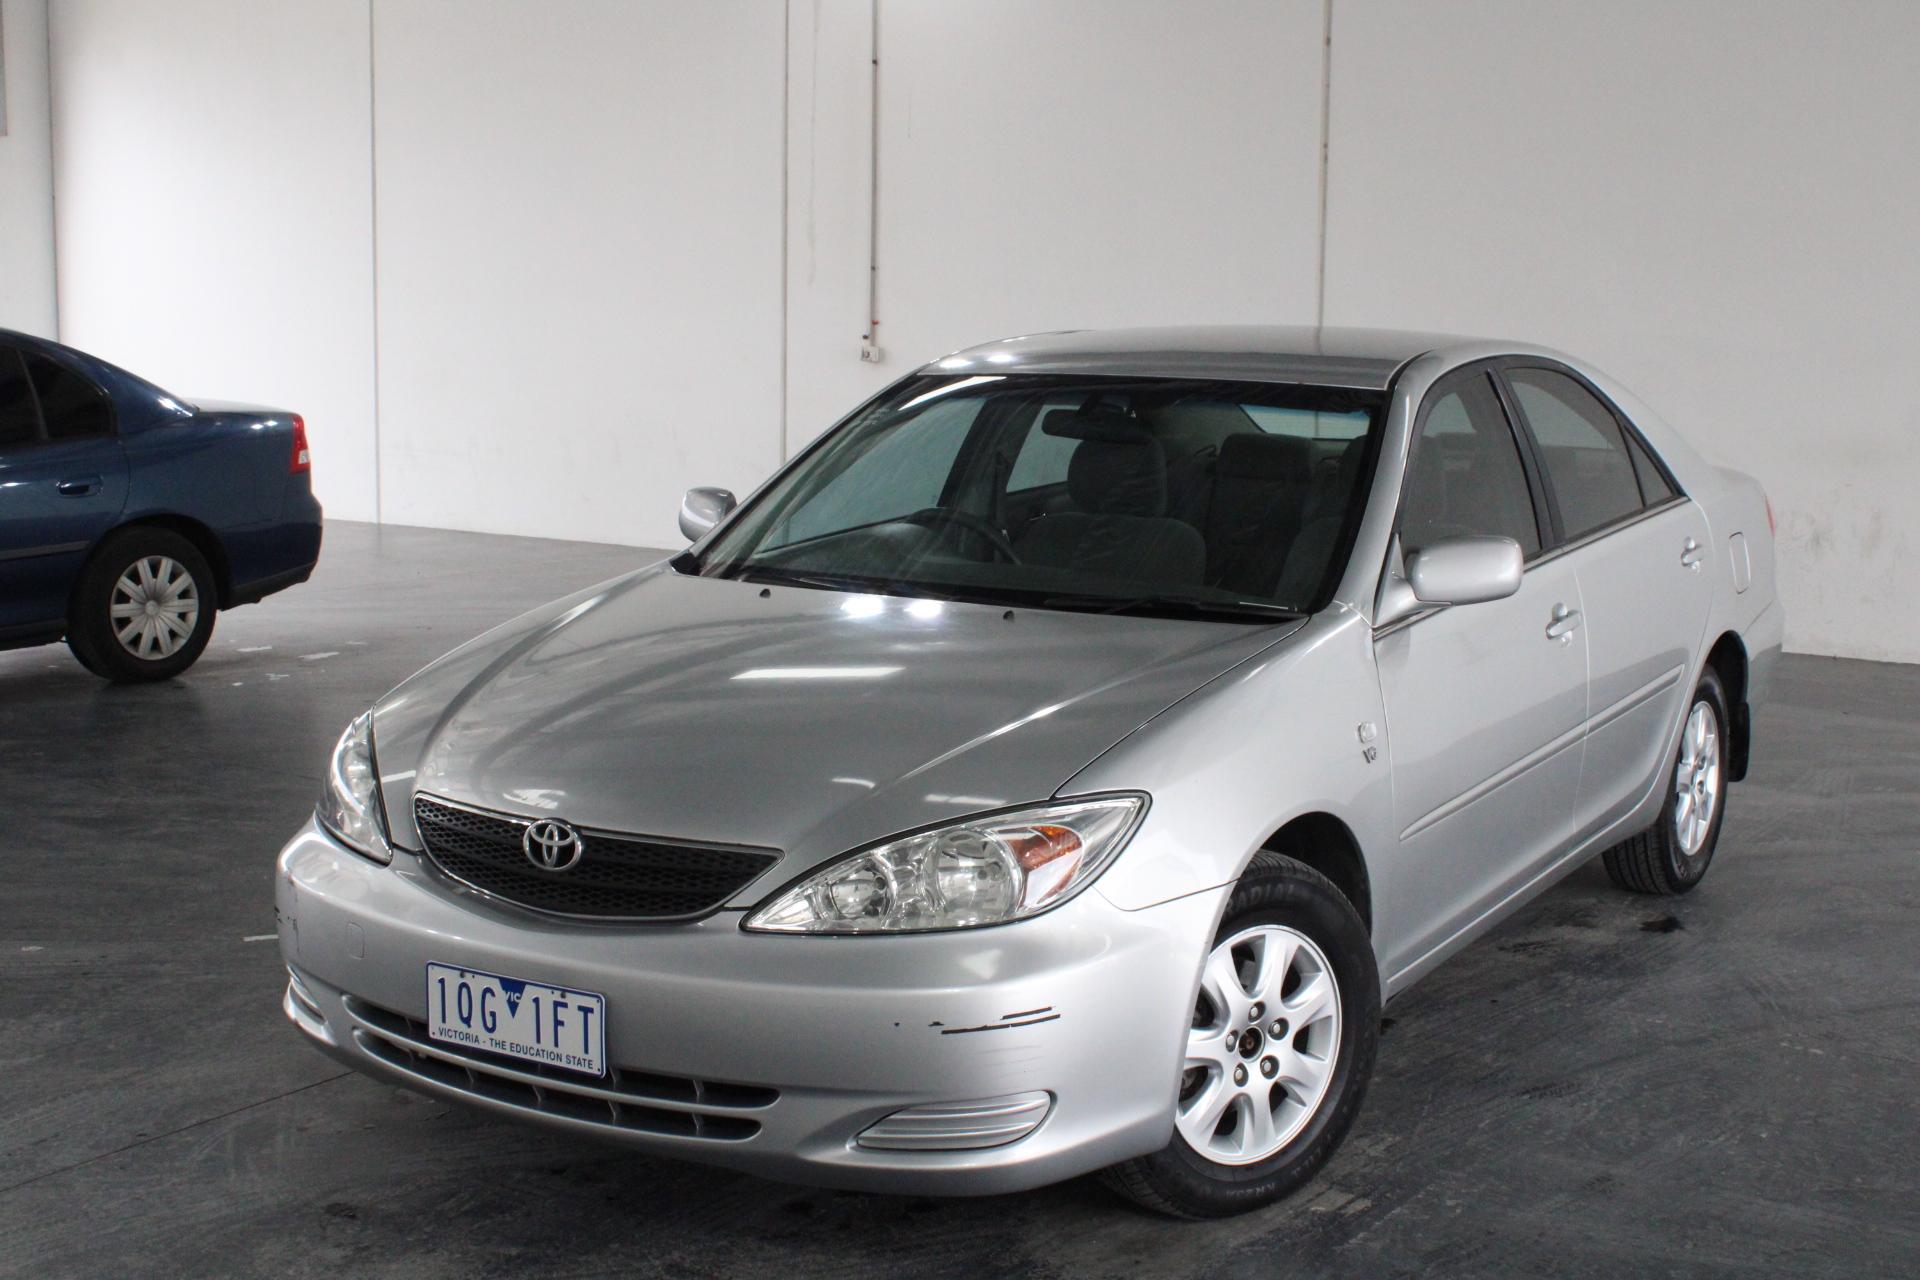 2003 Toyota Camry Ateva MCV36R Automatic Sedan